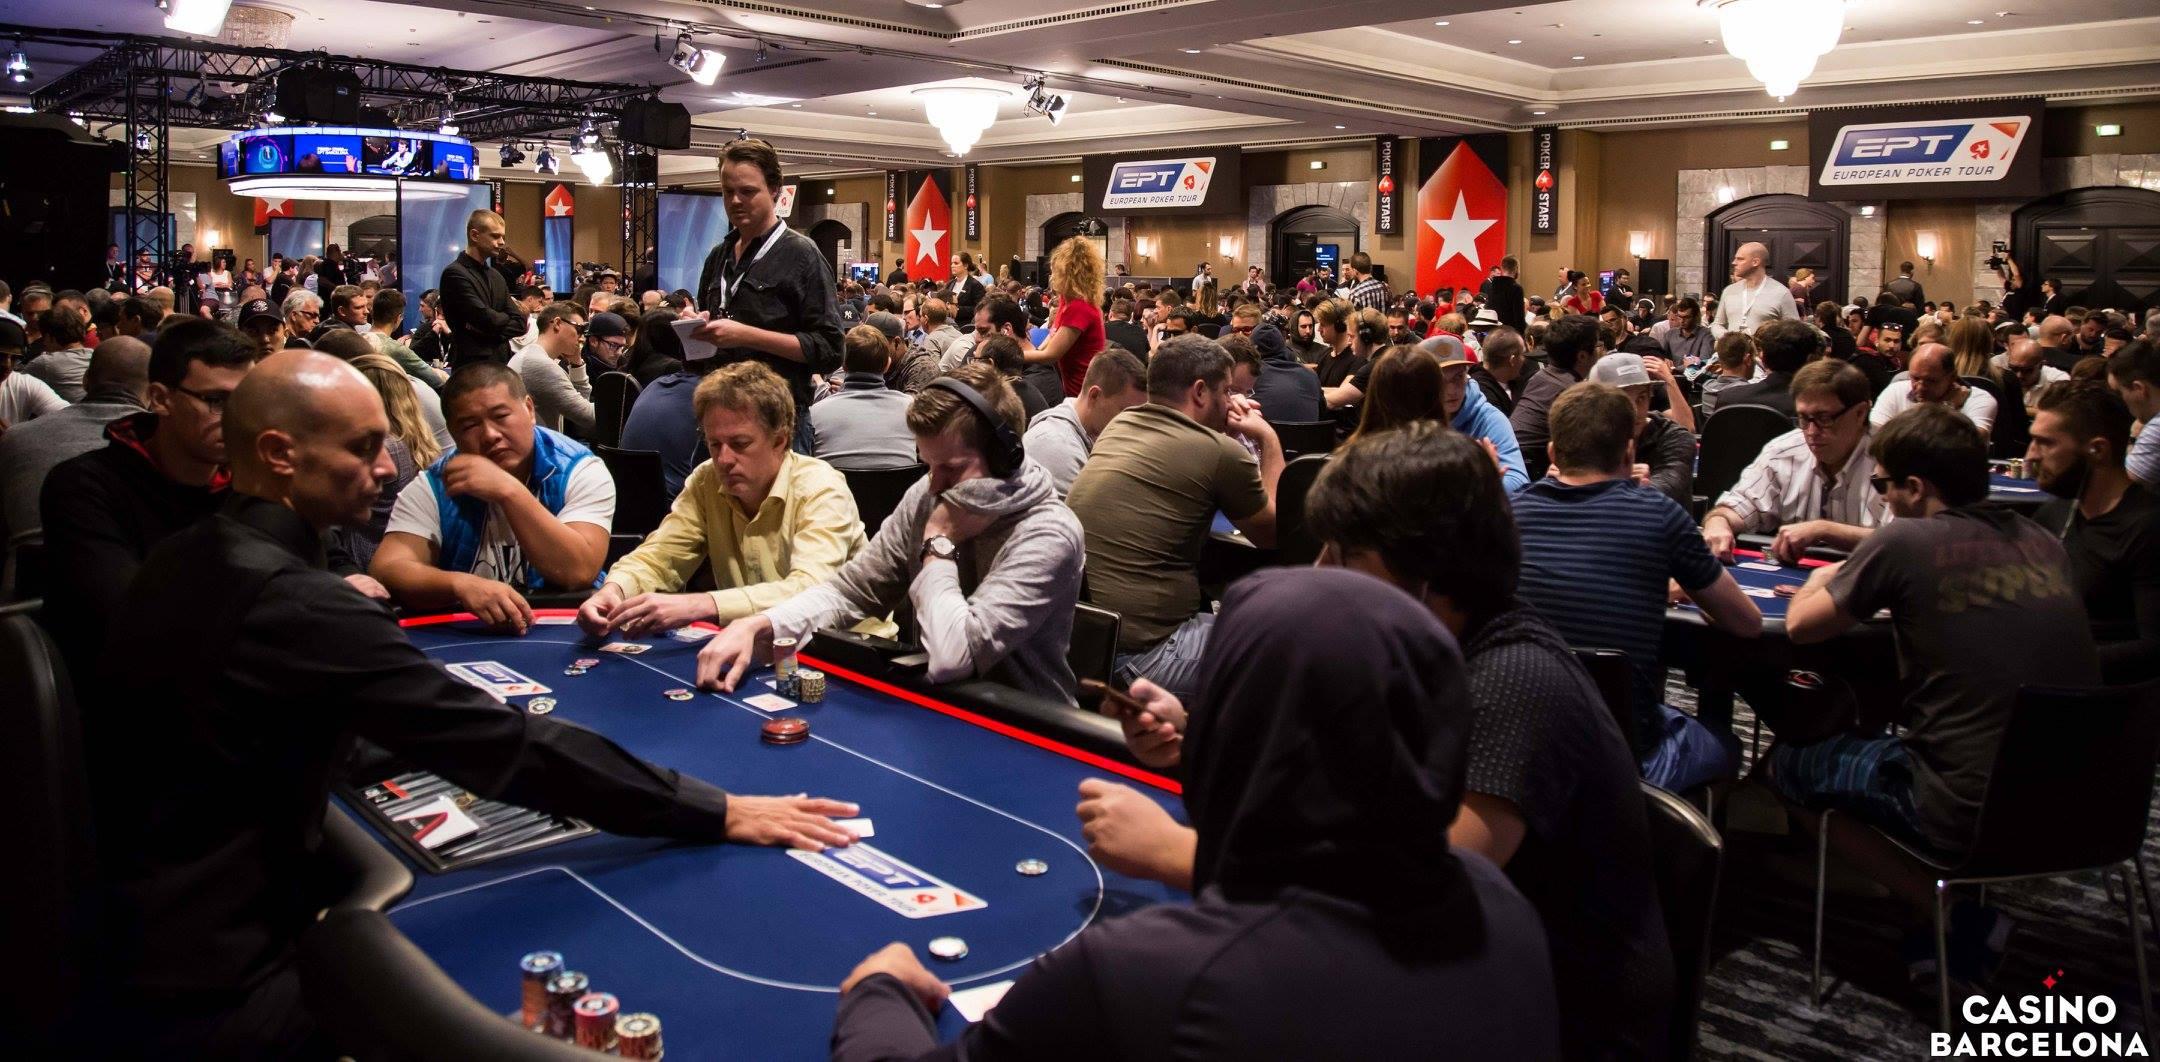 poker tournaments casino barcelona